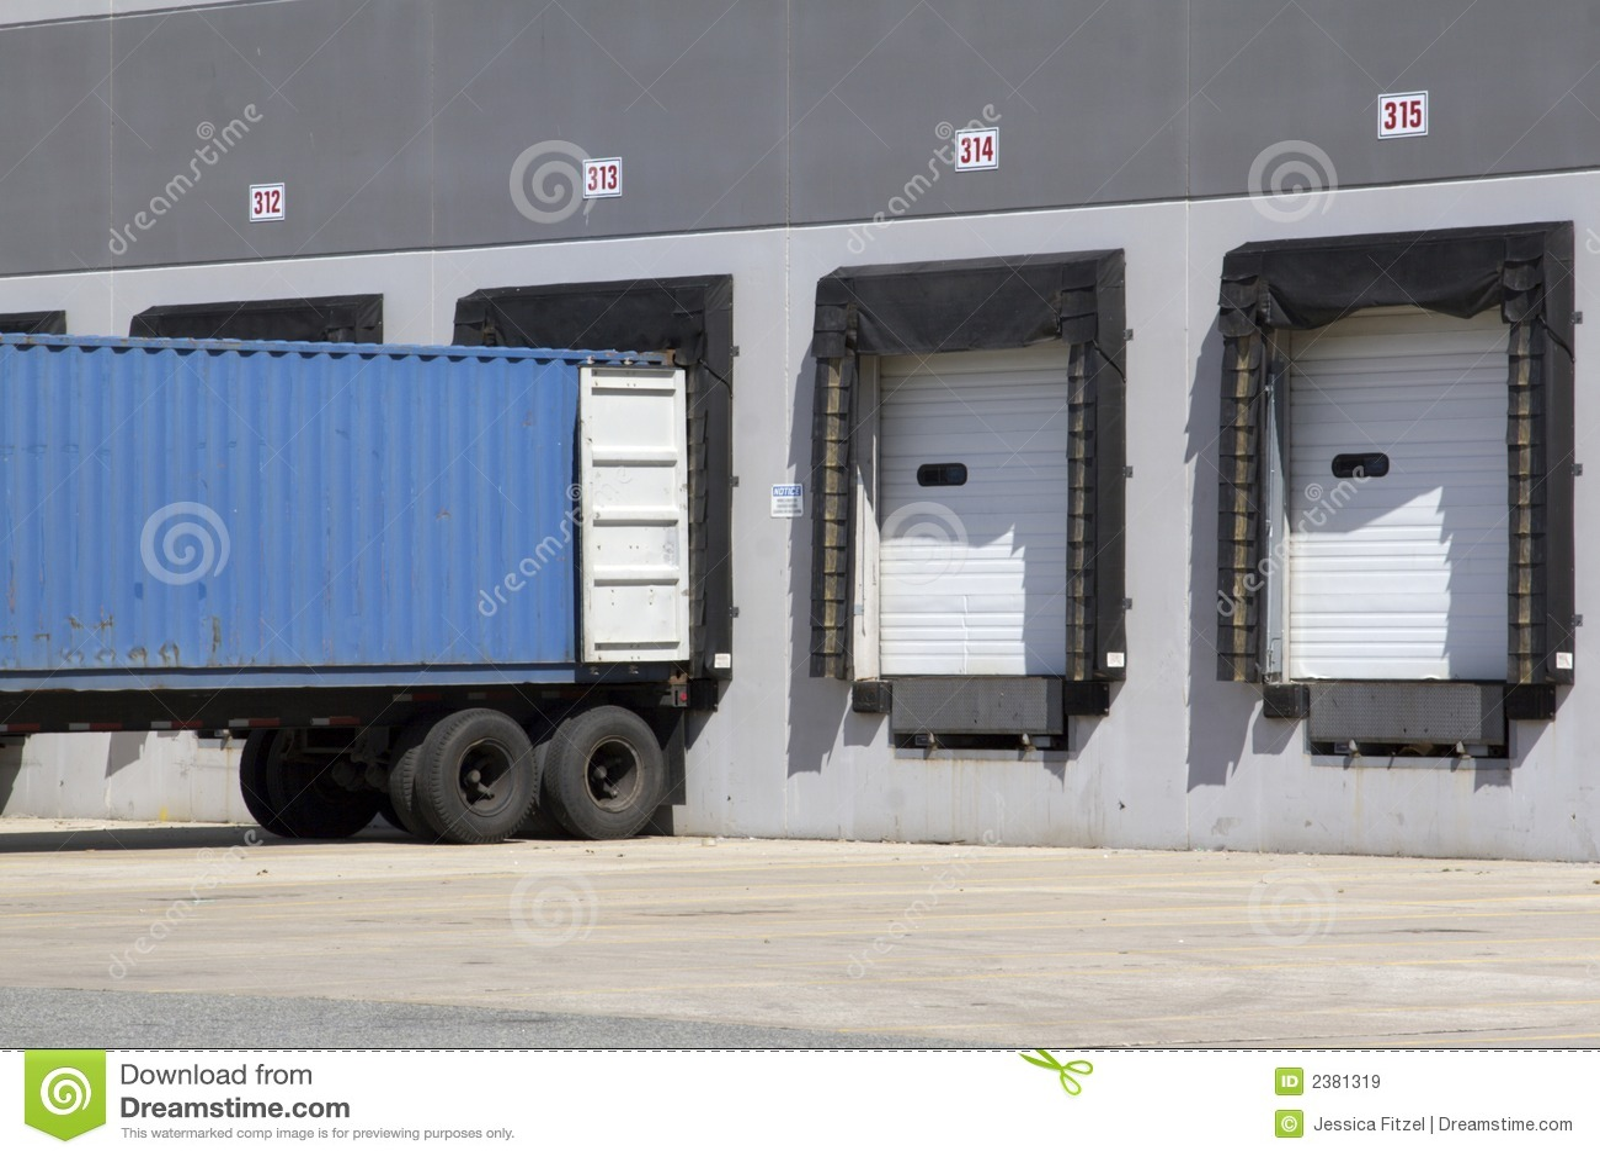 Warehouse truck loading